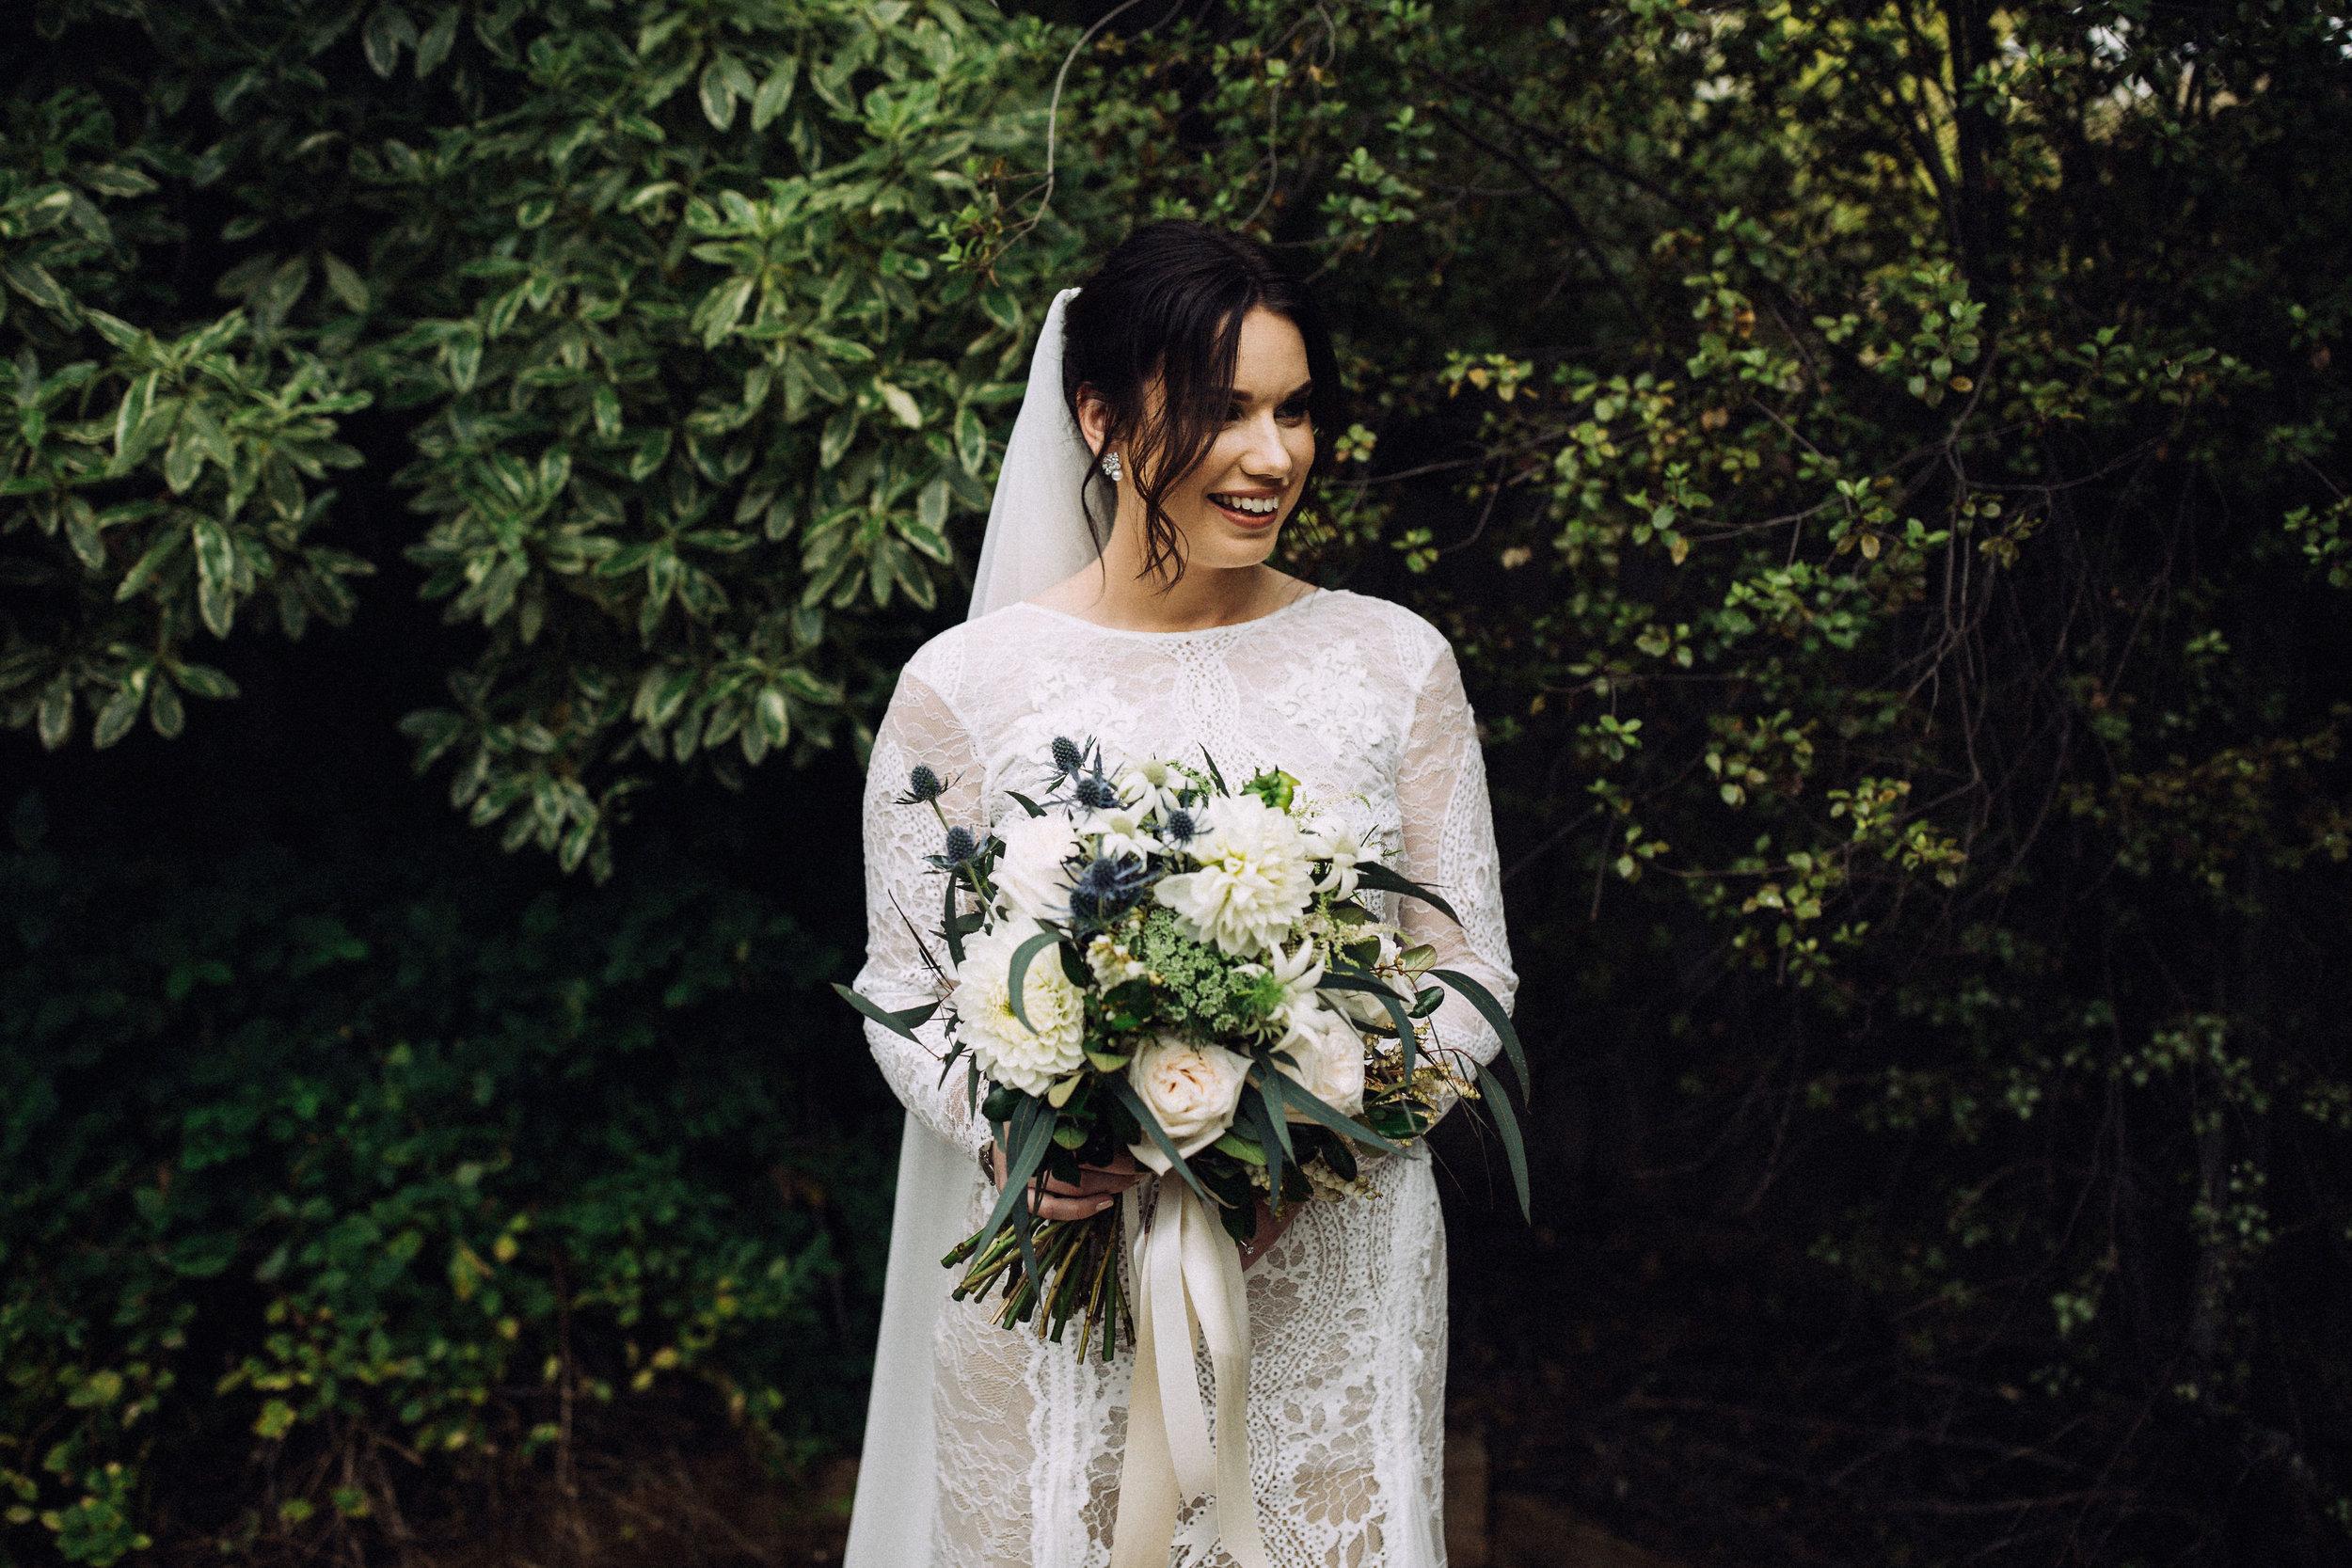 brides in bloom - - view -